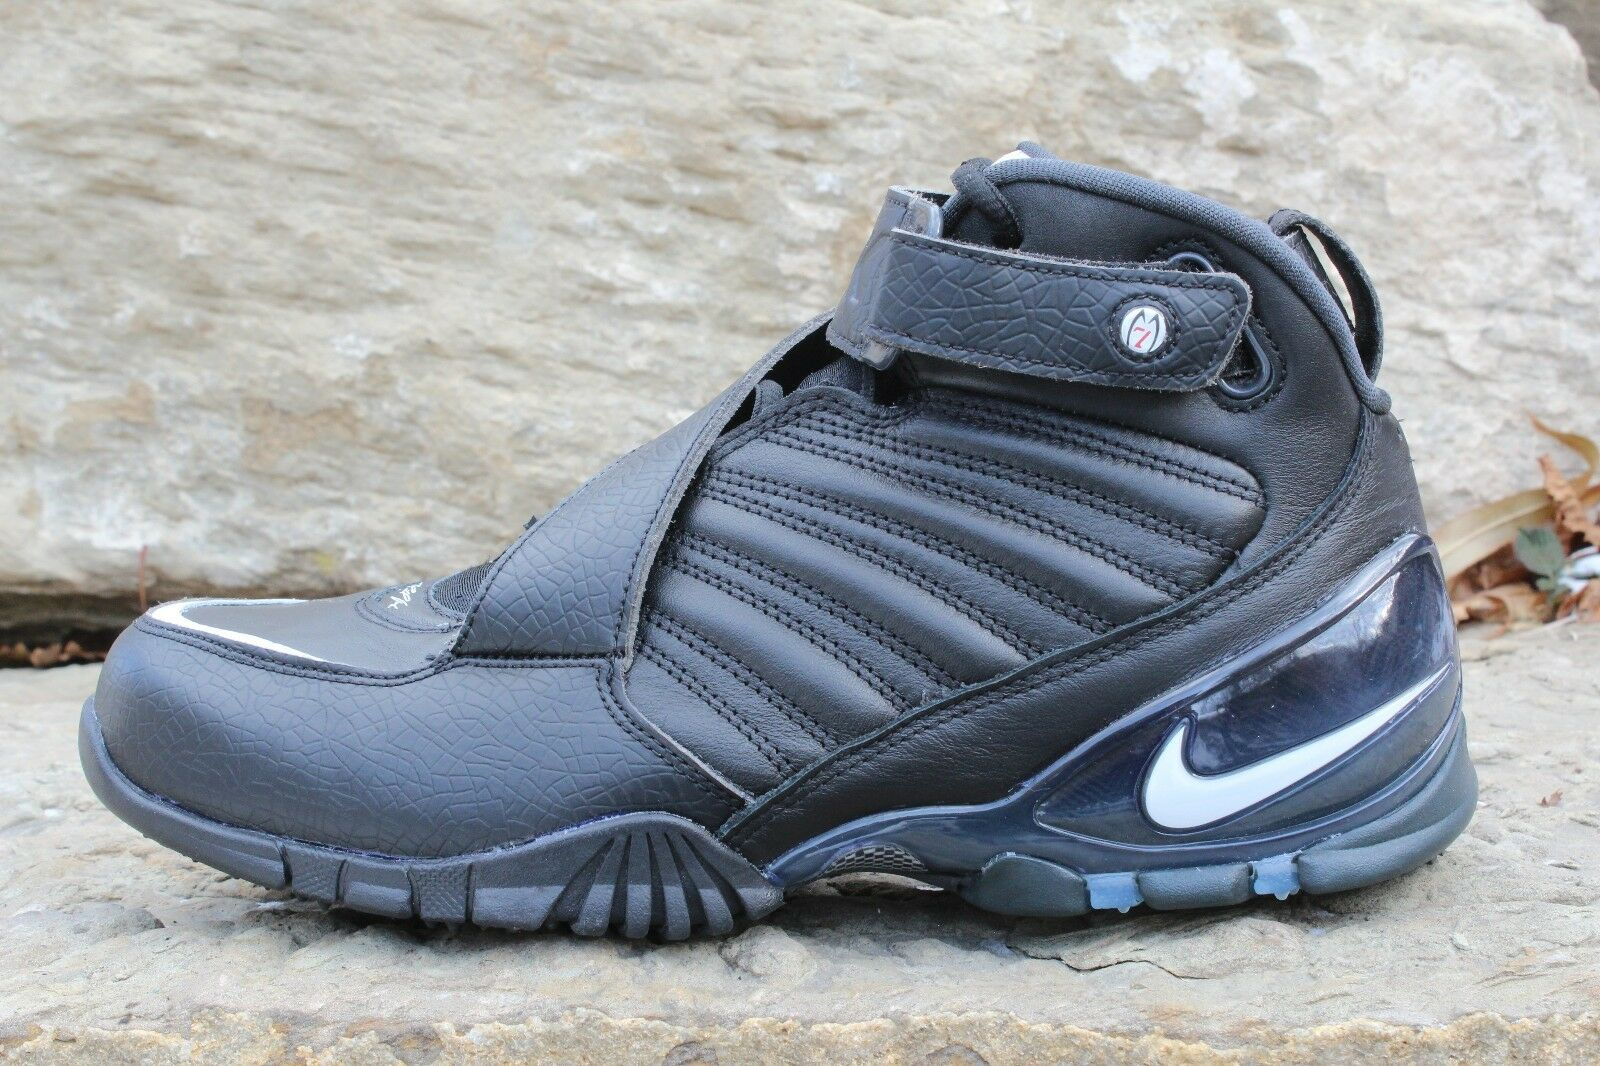 12 New Nike Zoom Vick III Football Trainers Shoes Black Sz 8-12 832698 002